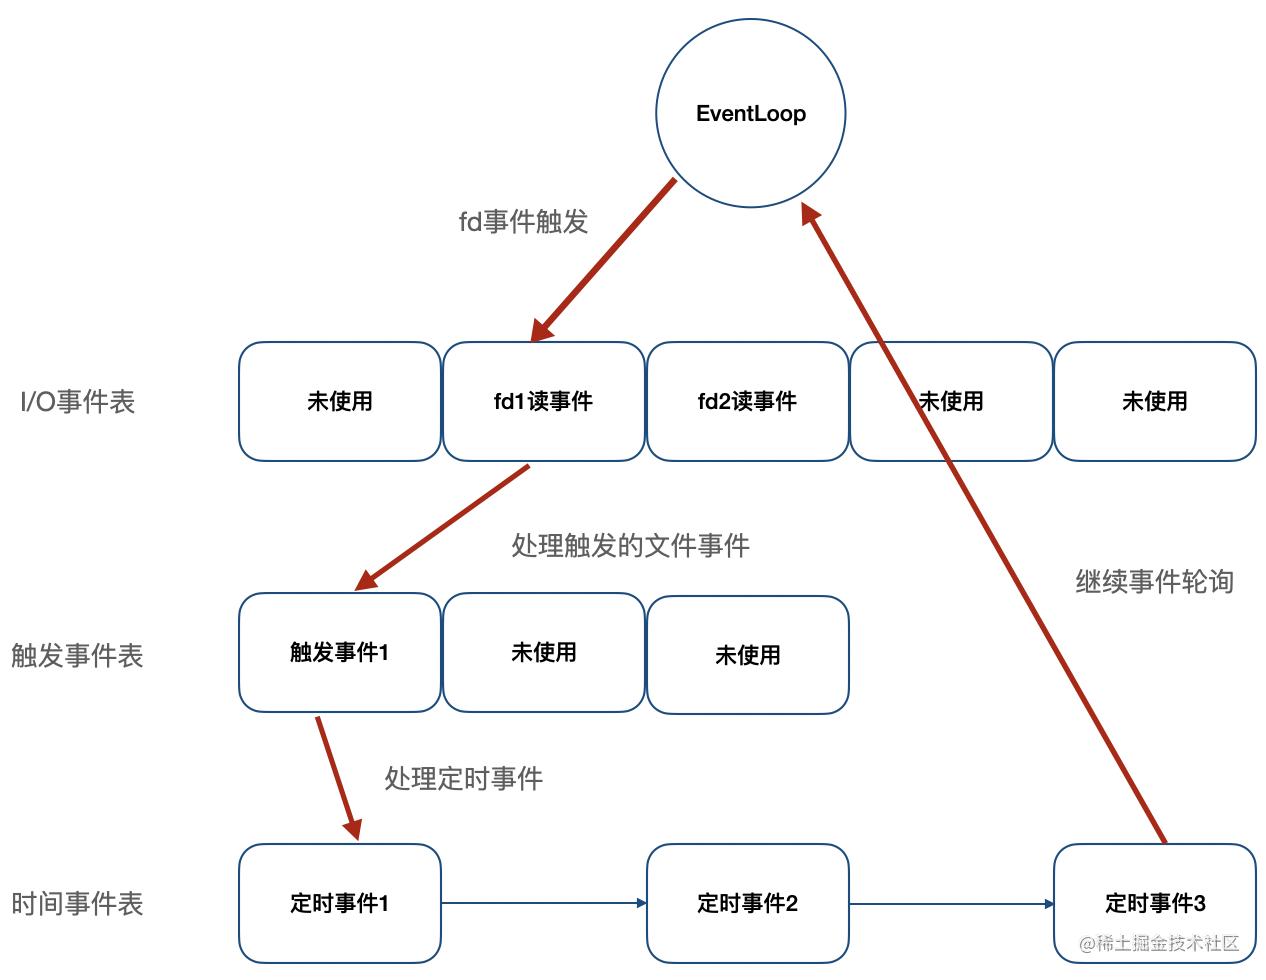 事件调度http://note.youdao.com/yws/res/69489/642EDA3CC49142B1BF1ABD5FDEC89C44